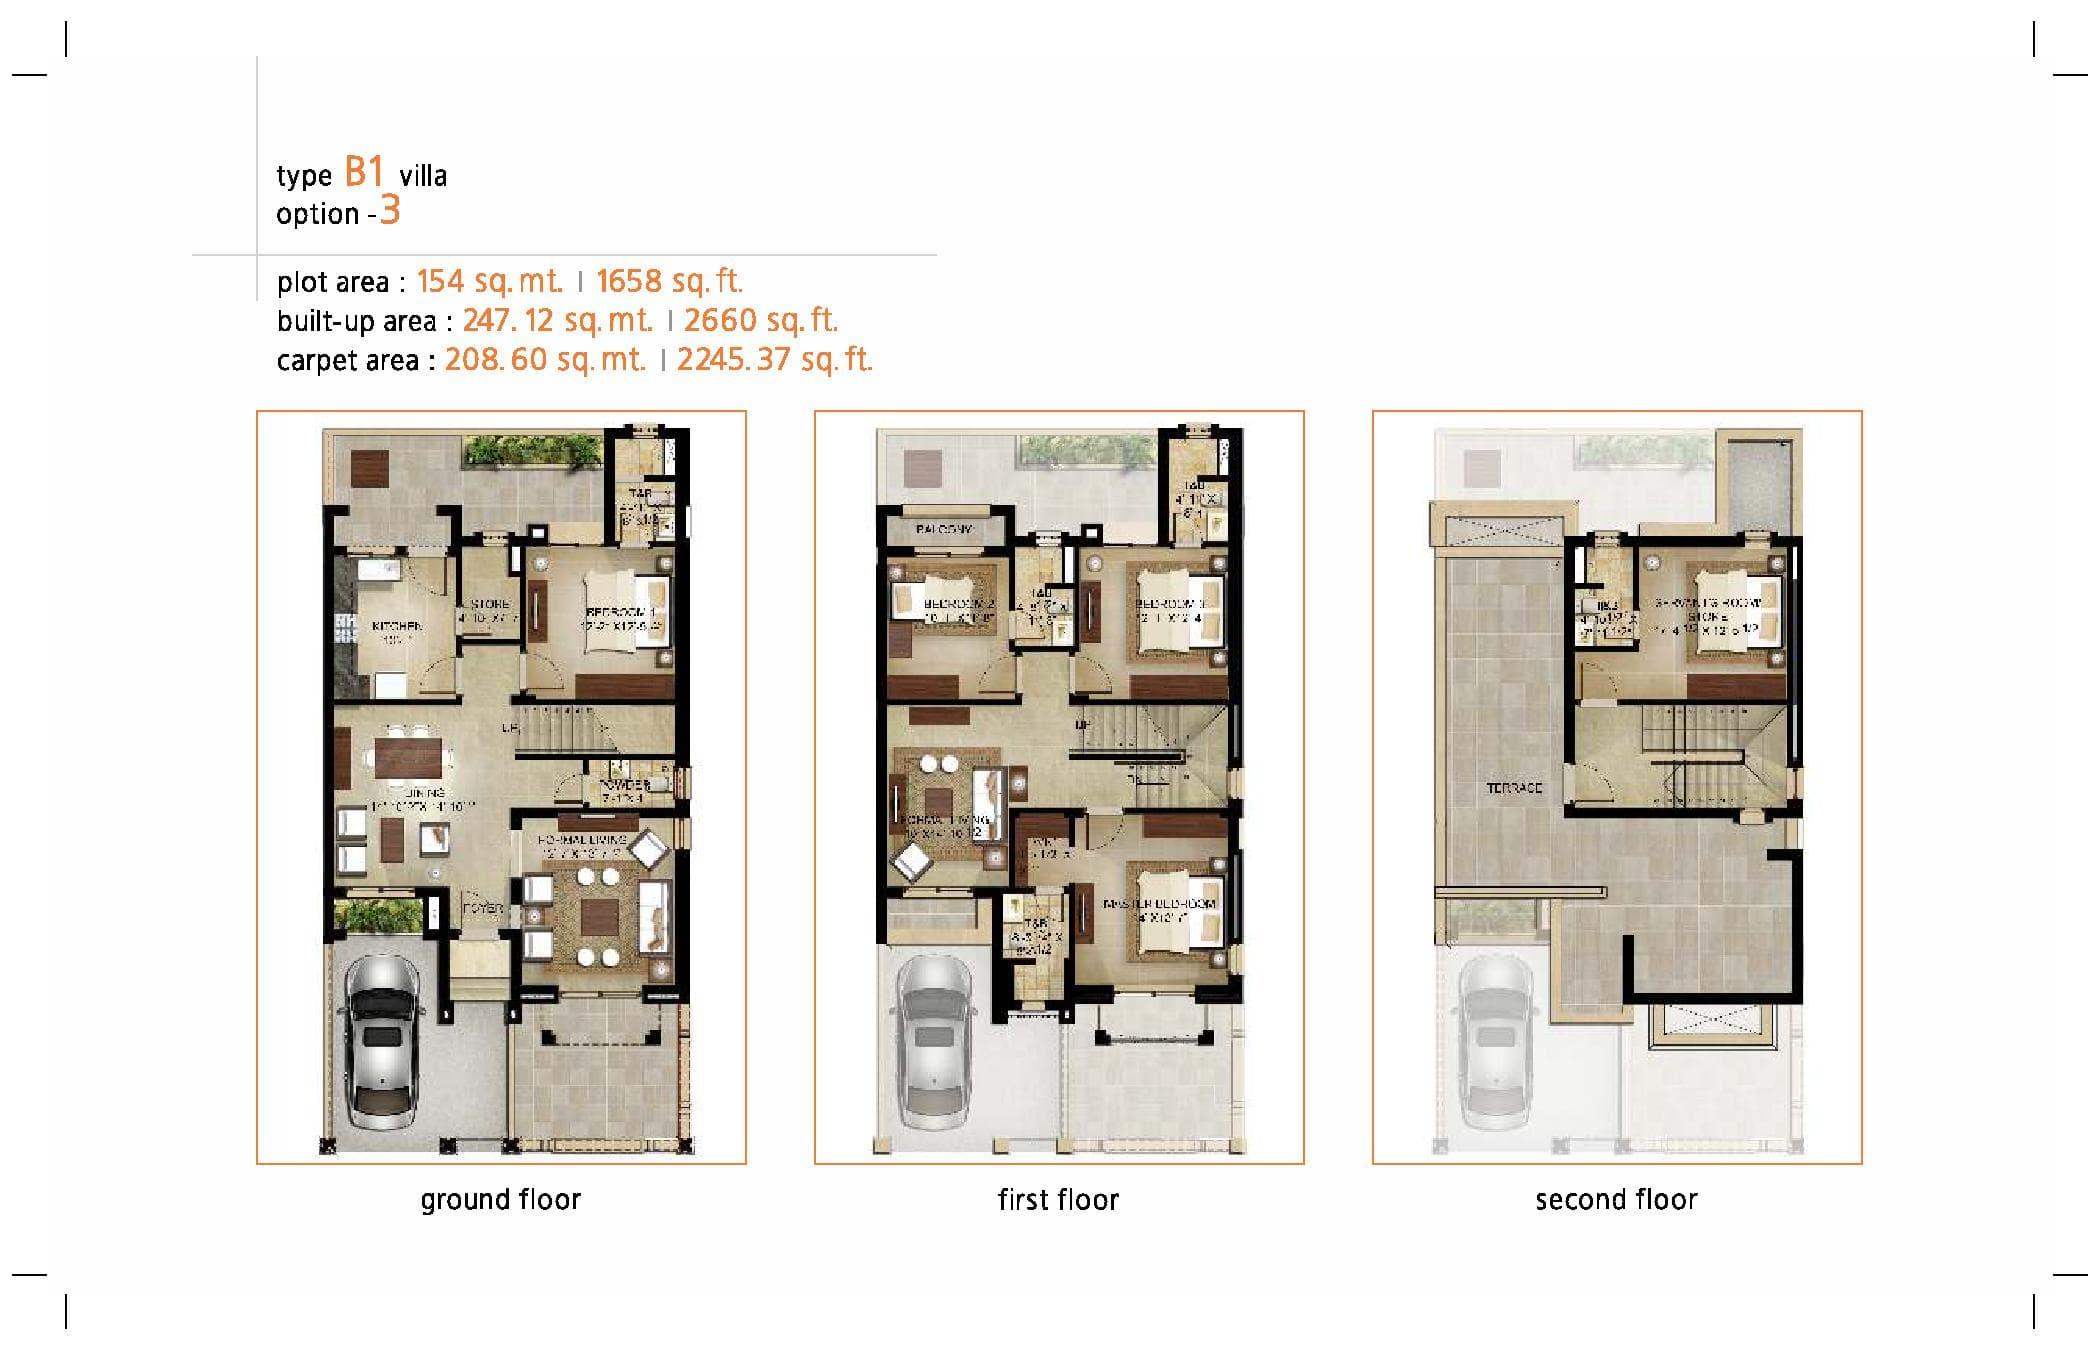 Garden Bay type B1 Villa